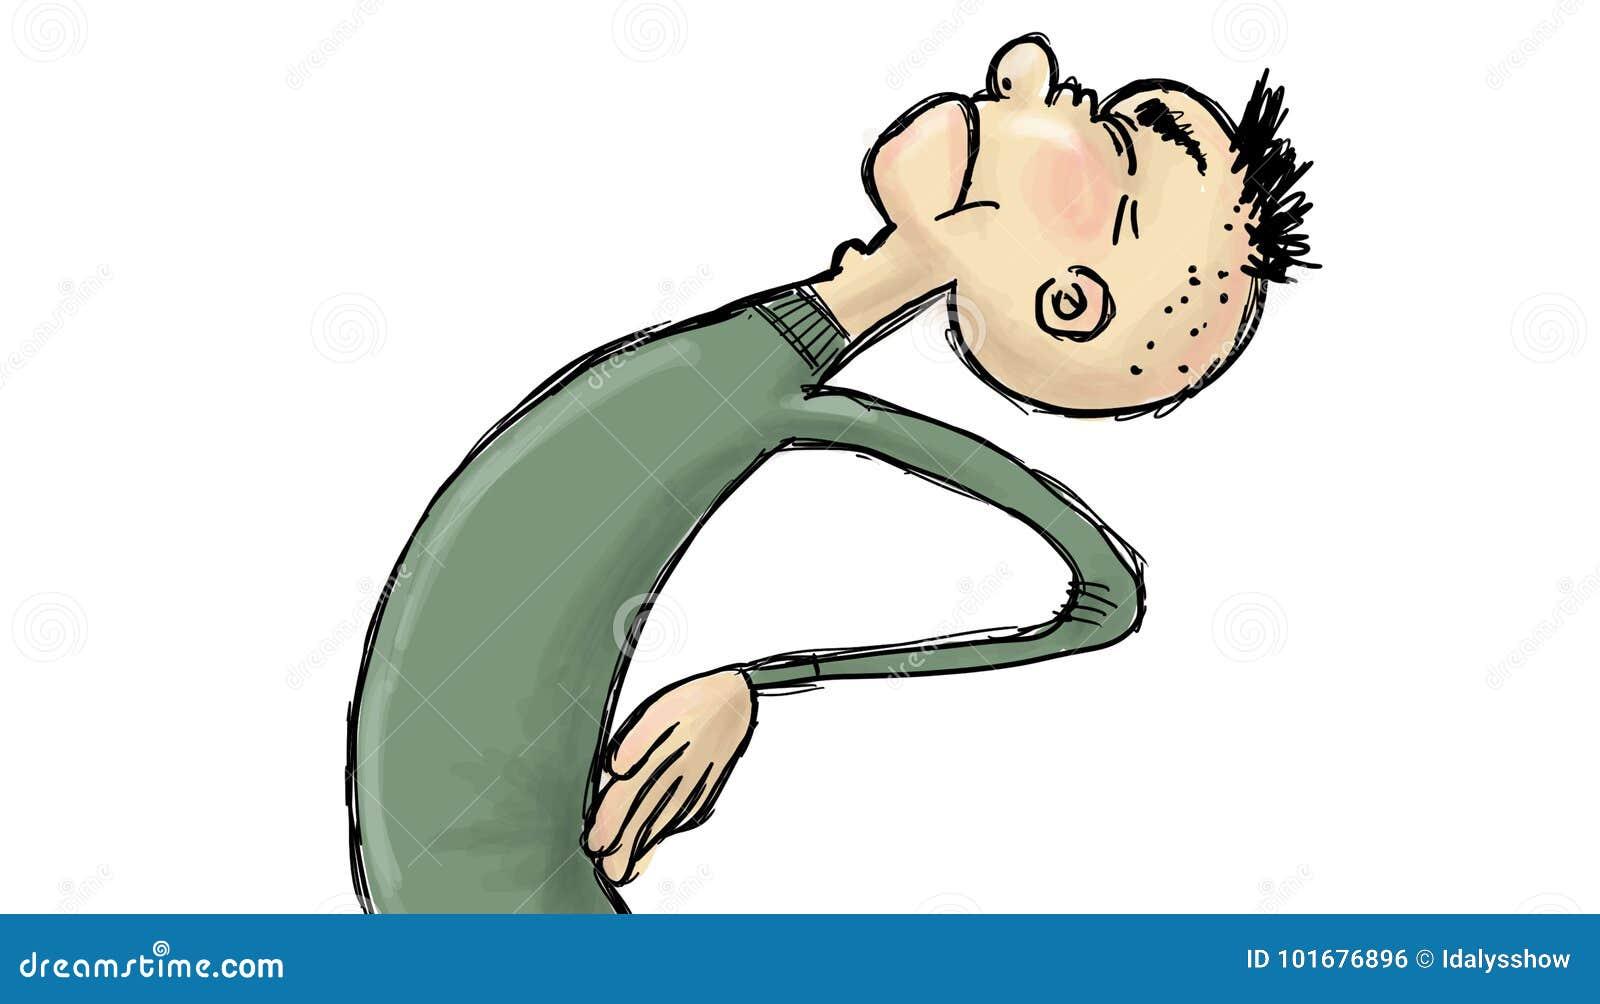 Pain Cartoons  Illustrations  U0026 Vector Stock Images